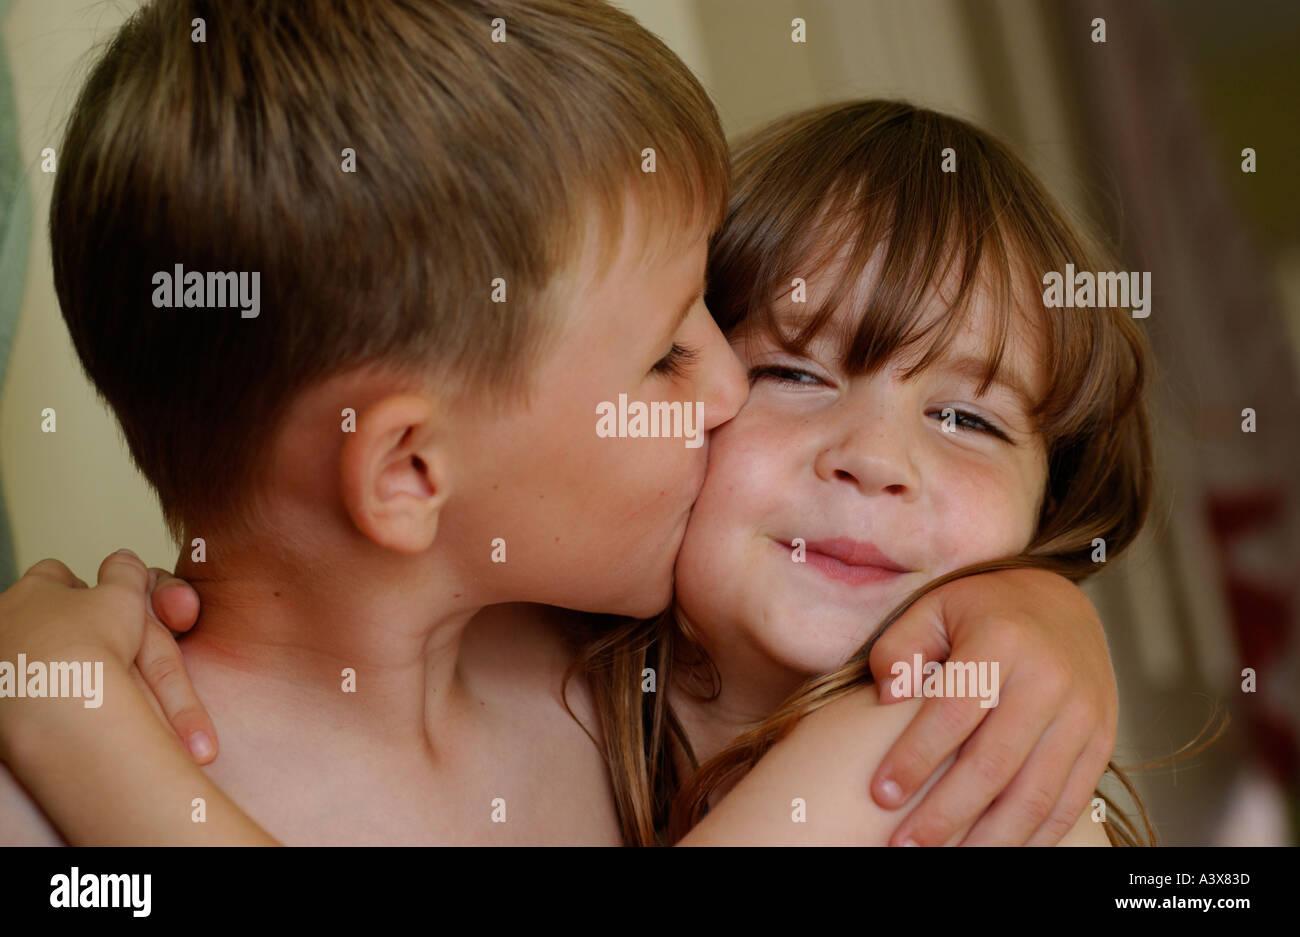 Boy Kissing A Girl On The Cheek Stock Photo 2025532 - Alamy-3533